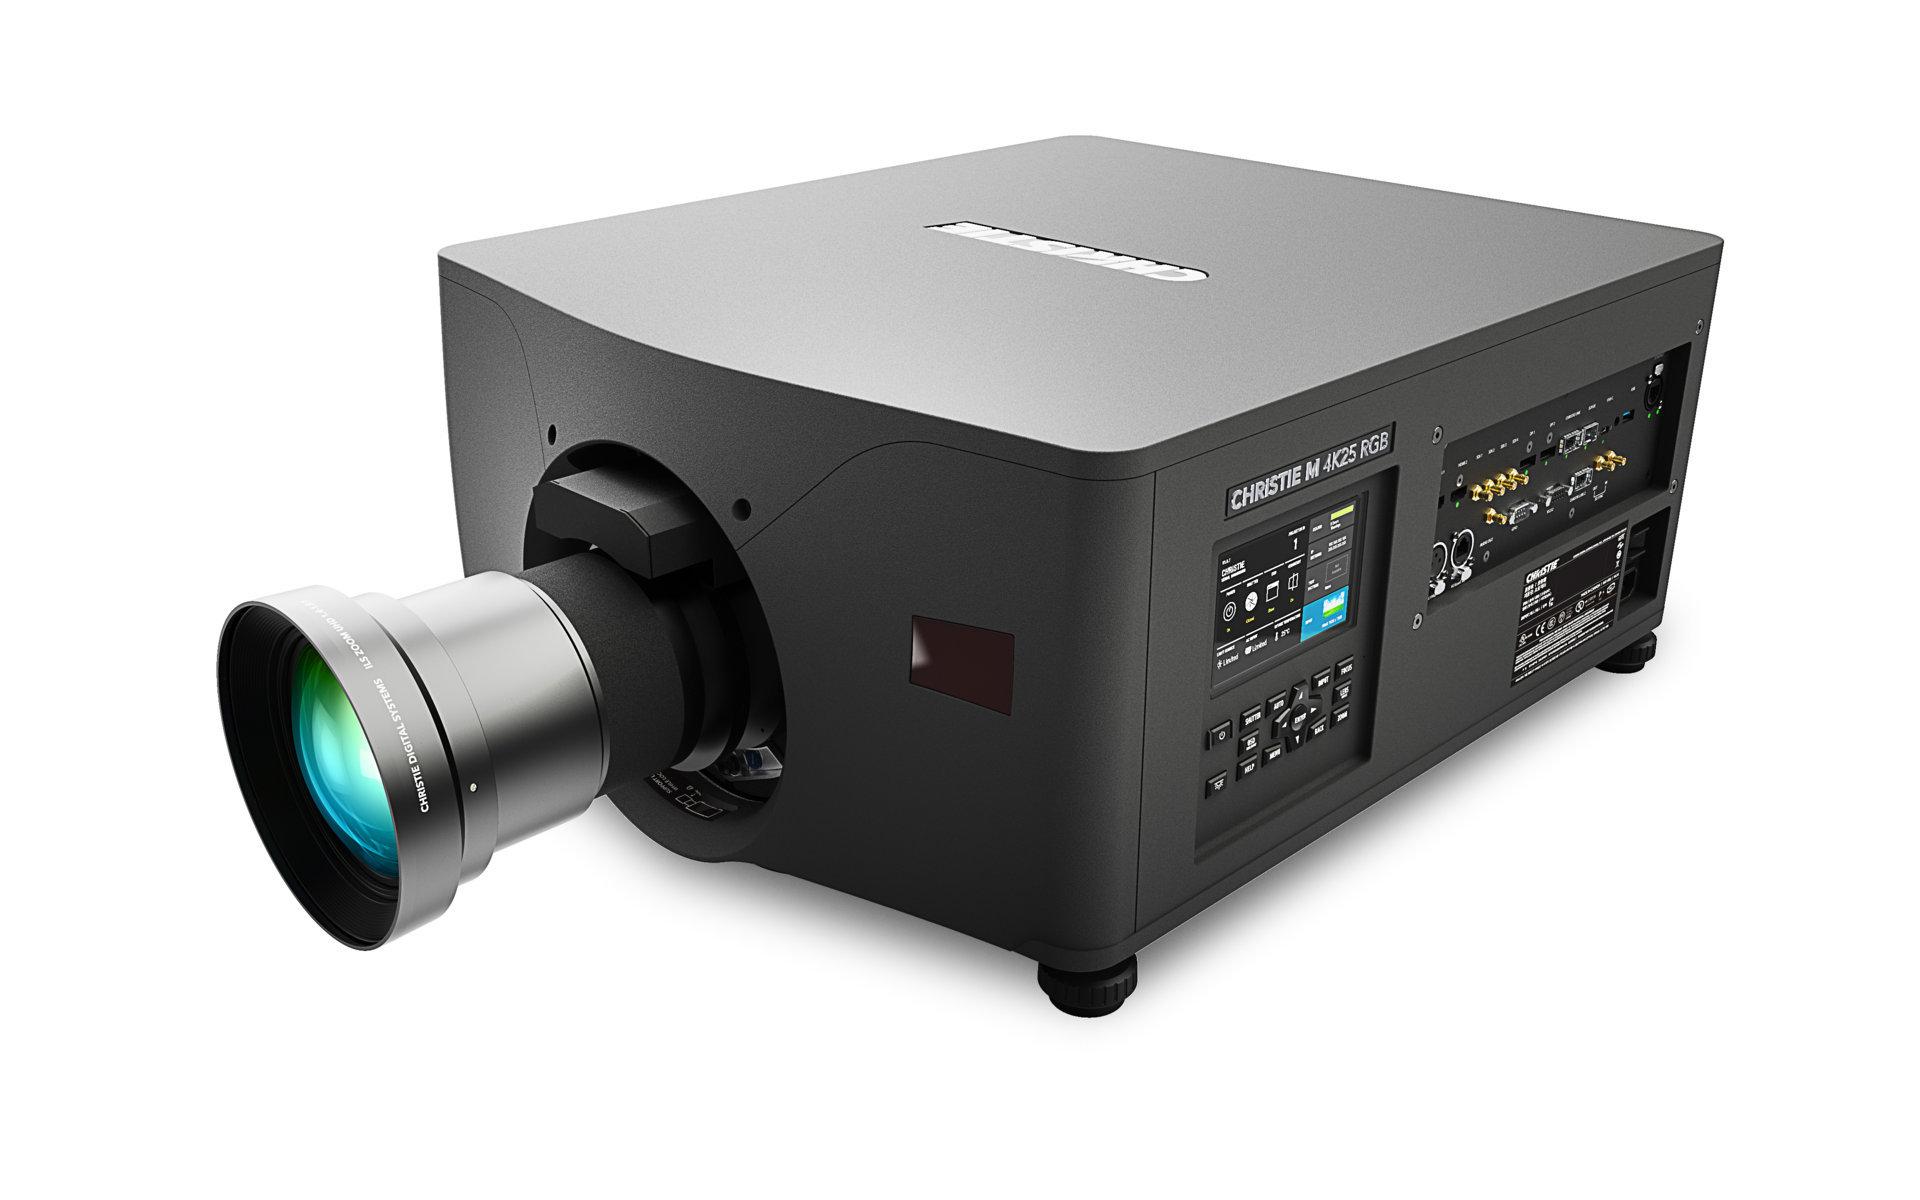 proyector RGB de láser puro M 4K25 de Christie